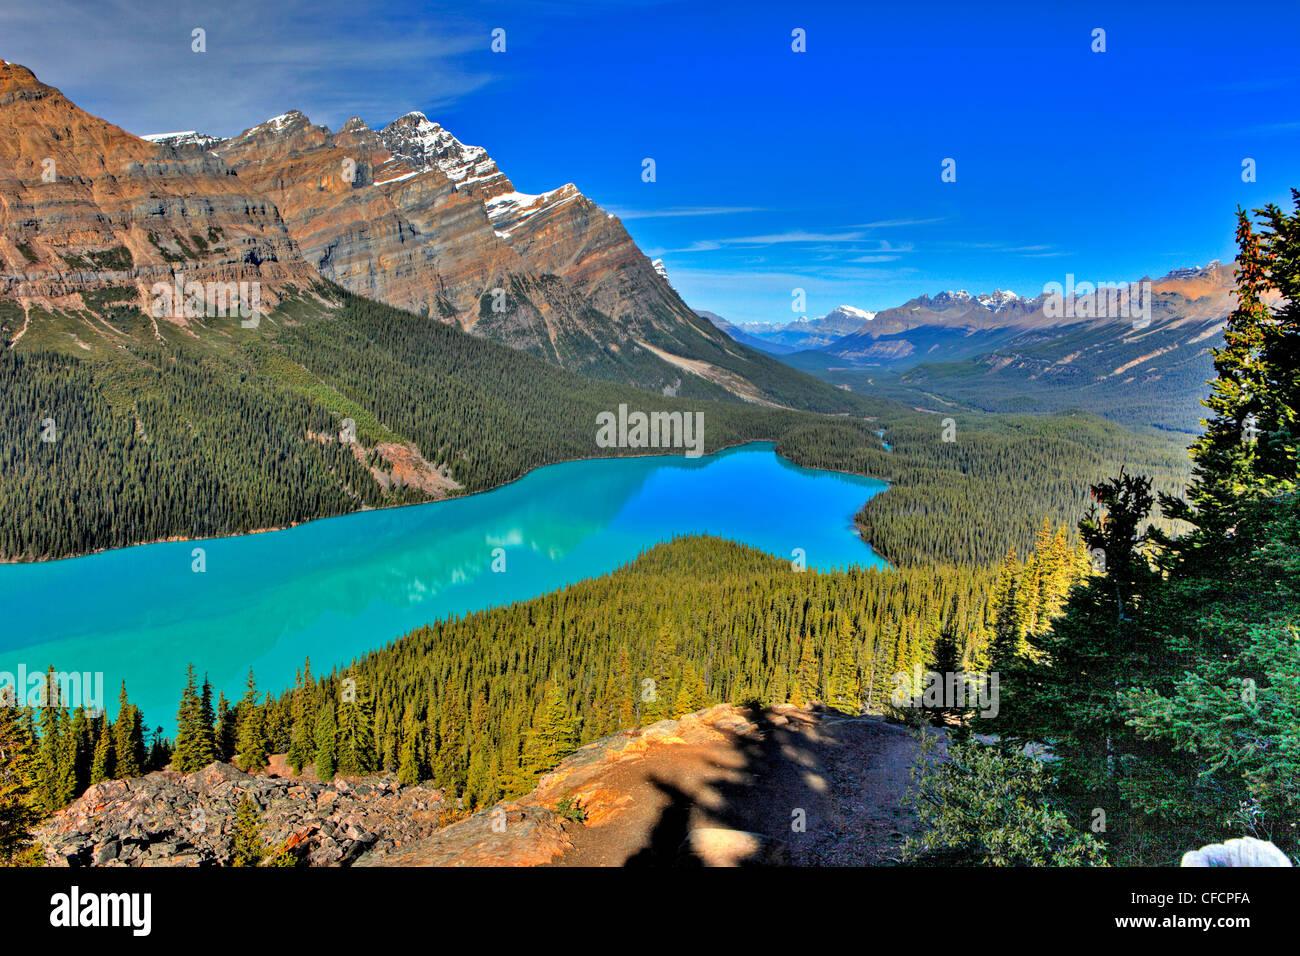 Le lac Peyto, Banff National Park, Alberta, Canada Photo Stock